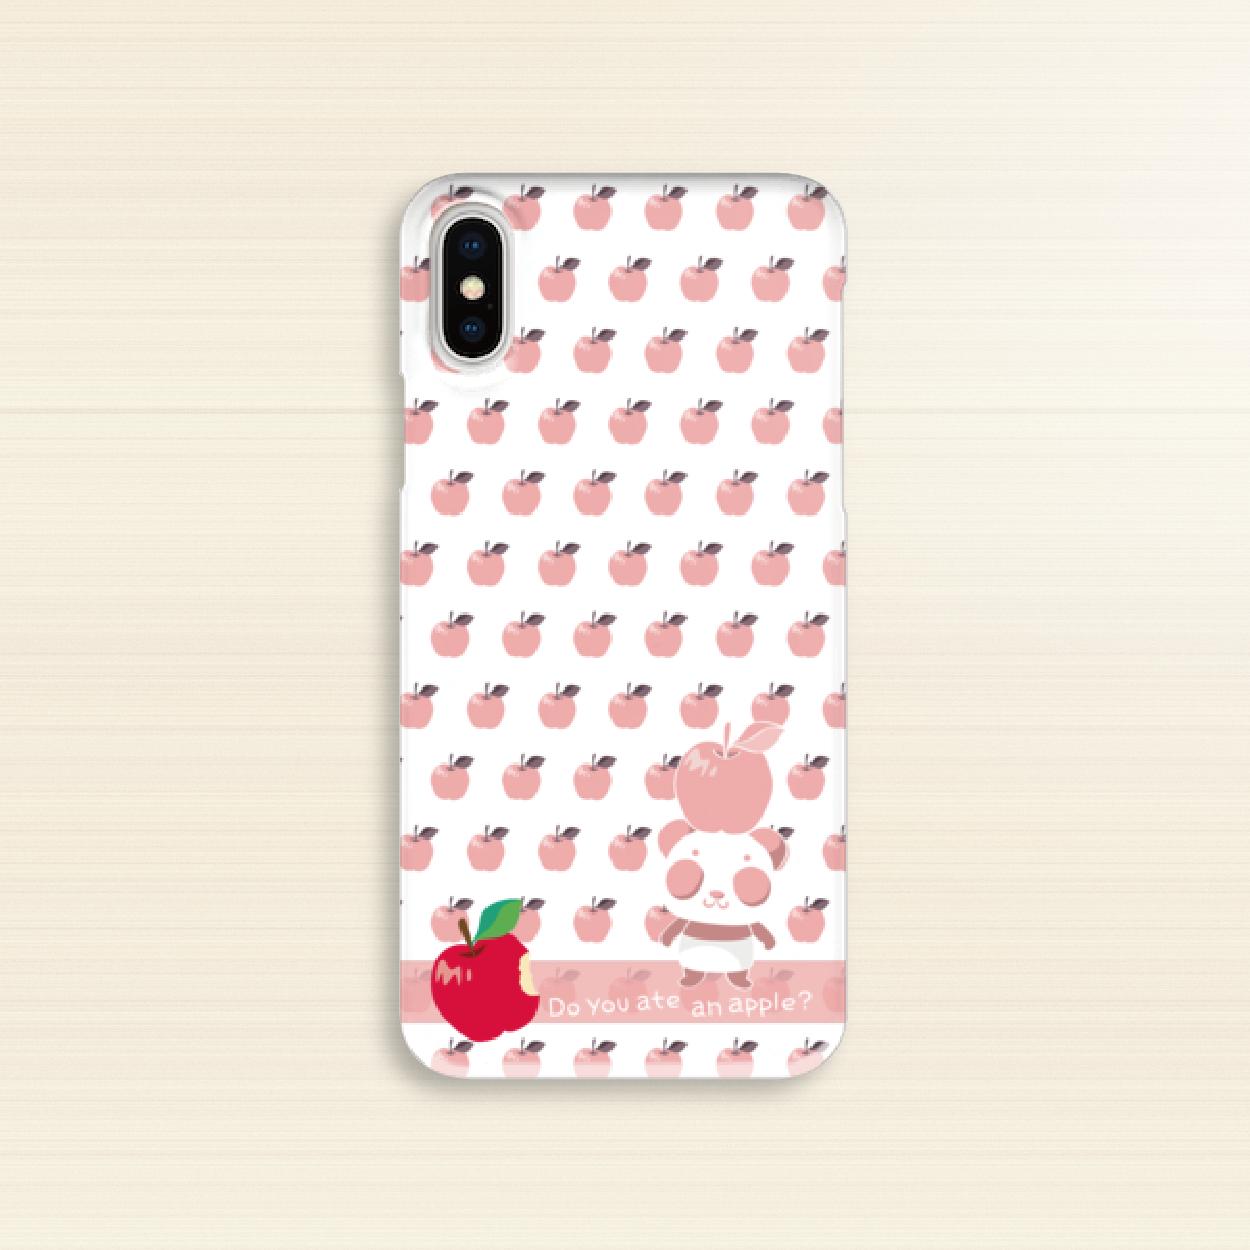 B*iPhone XR/XSMax/iPhone6Plus/6sPlus/7Plus/8Plus*透明ハードケース*CA19-19PHCo*ピンク*リンゴを食べたのは誰?